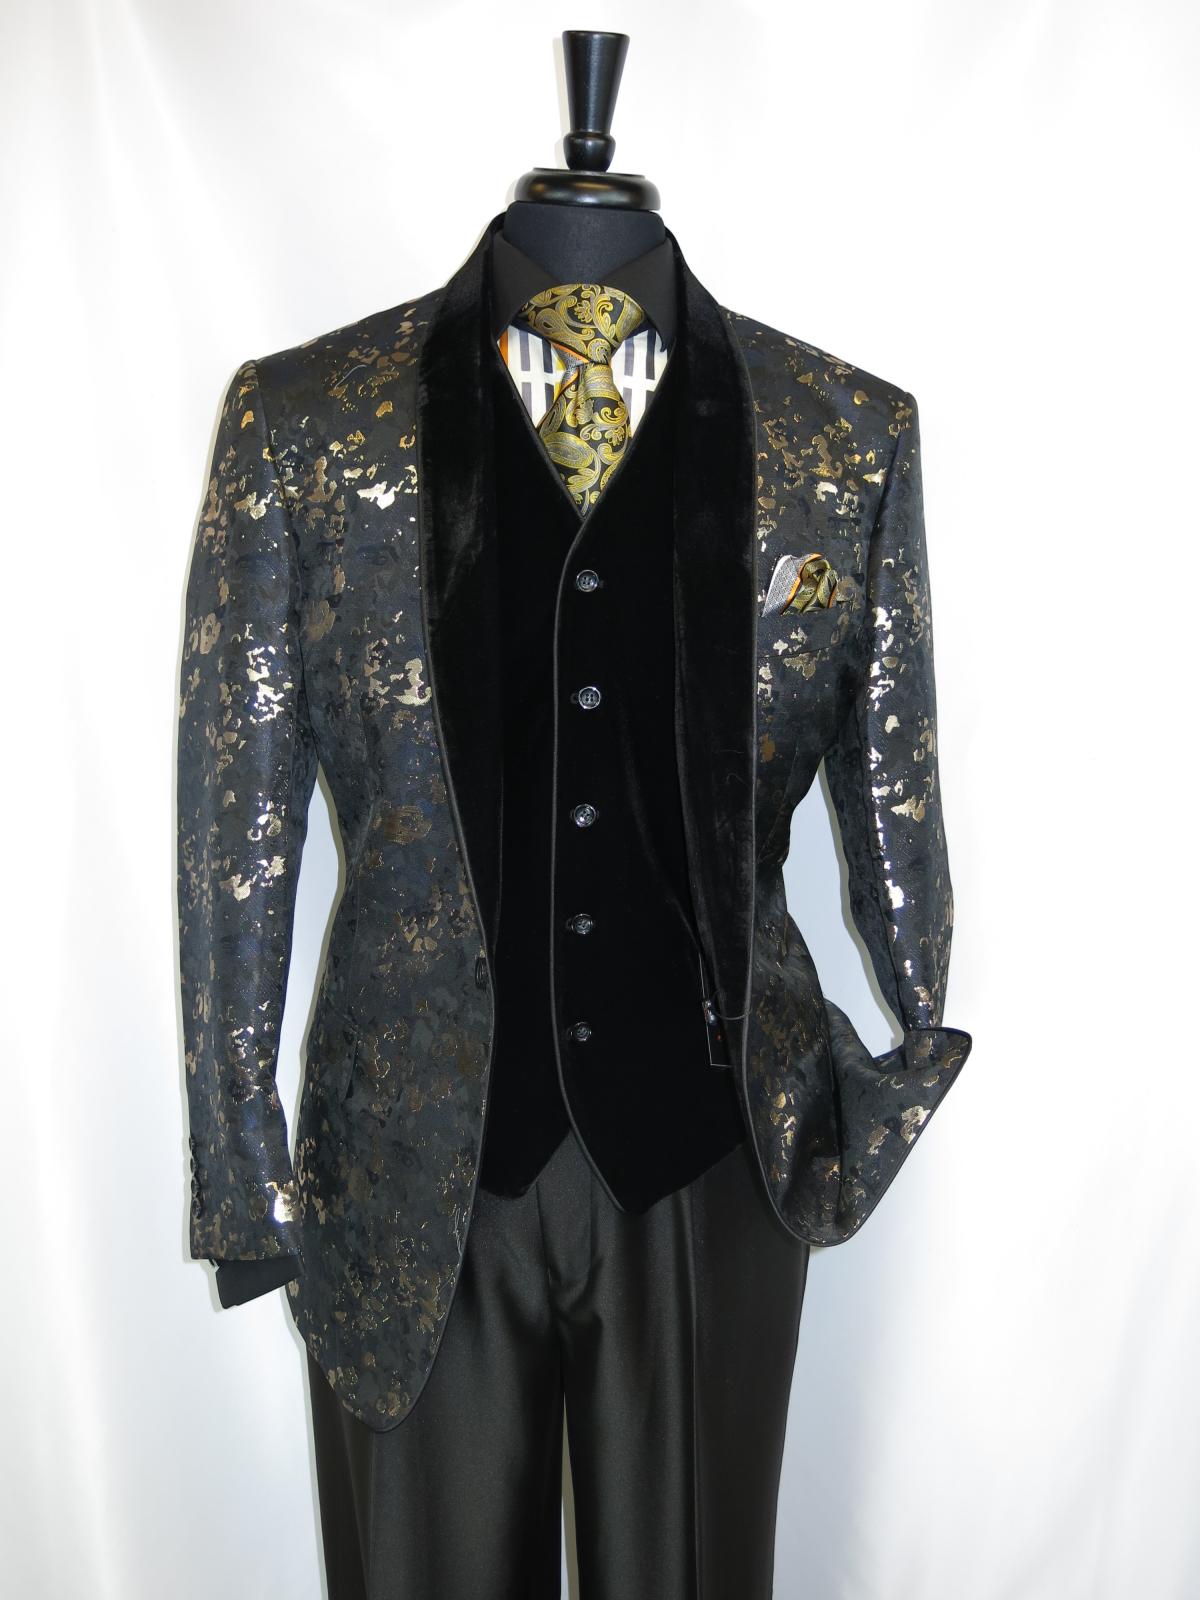 6bec300b527 Pallini S-Fl Men s 2 buttons Vested Suit Jacket in